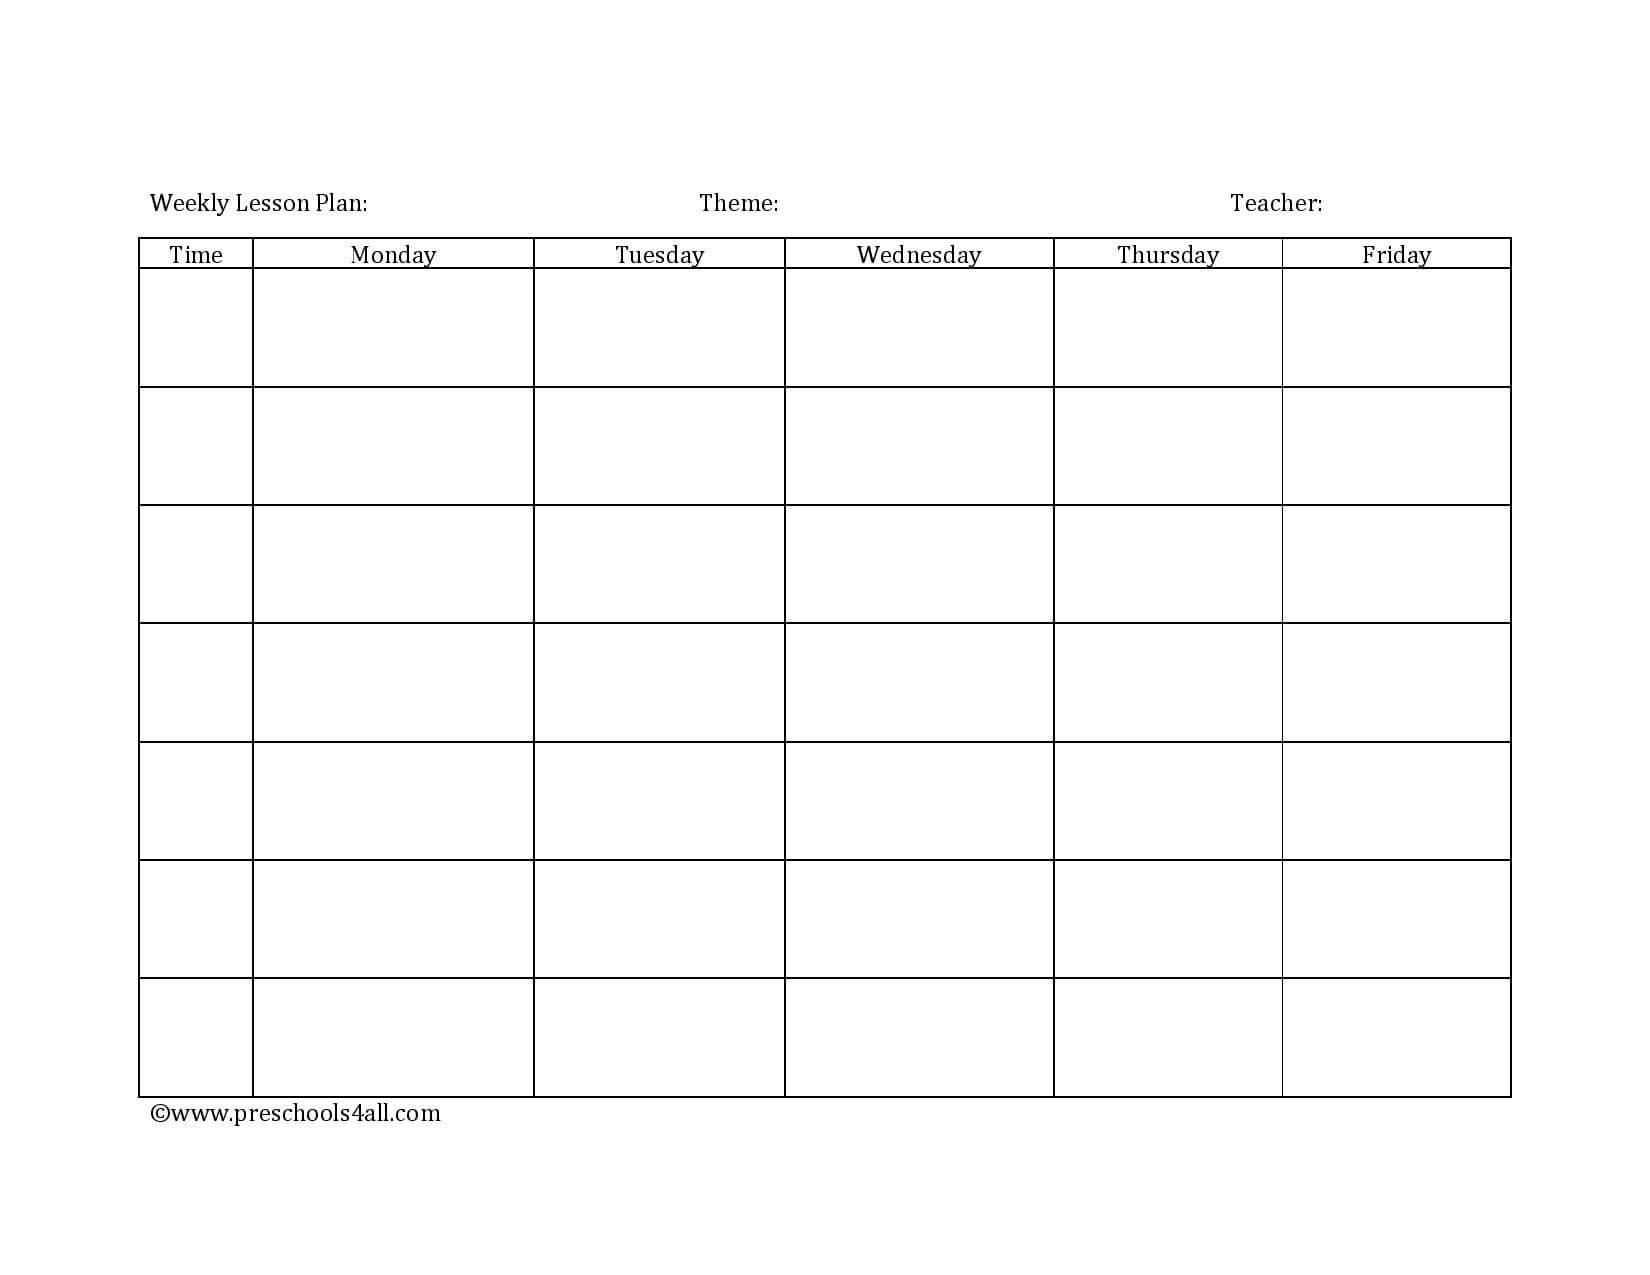 Preschool Lesson Plan Template - Lesson Plan Book Template throughout Blank Preschool Lesson Plan Template